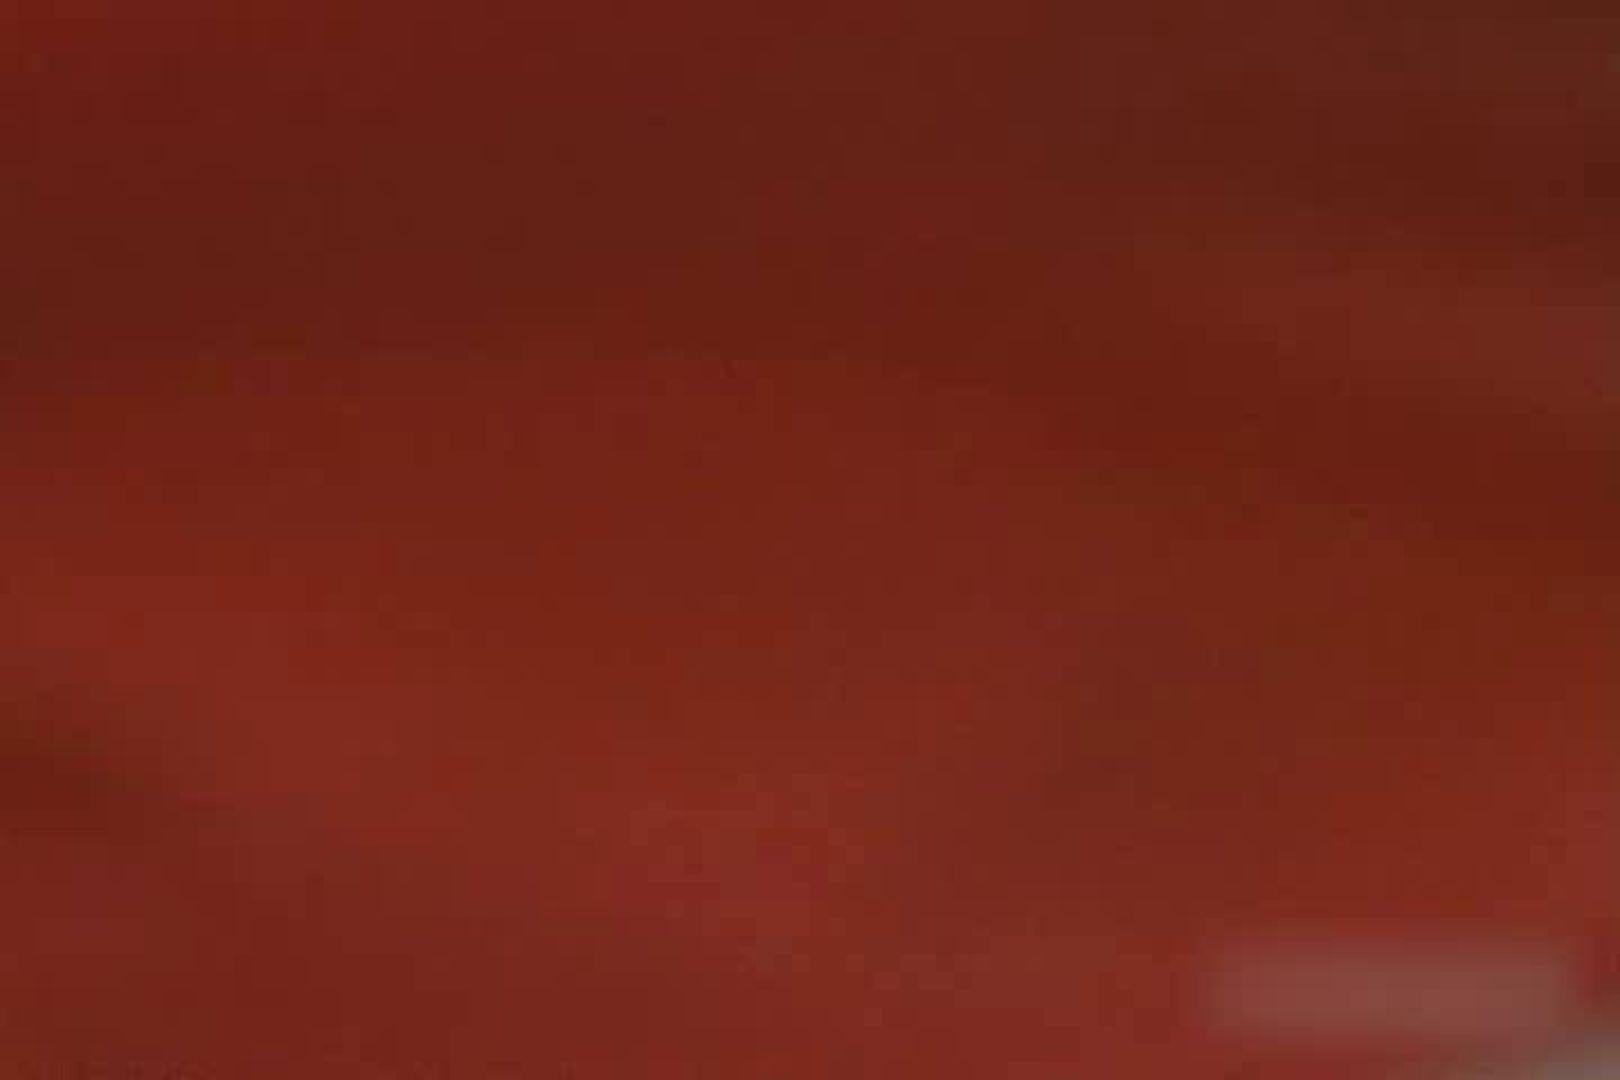 RQカメラ地獄Vol.28 OLの実態 | アイドルの実態  25pic 21